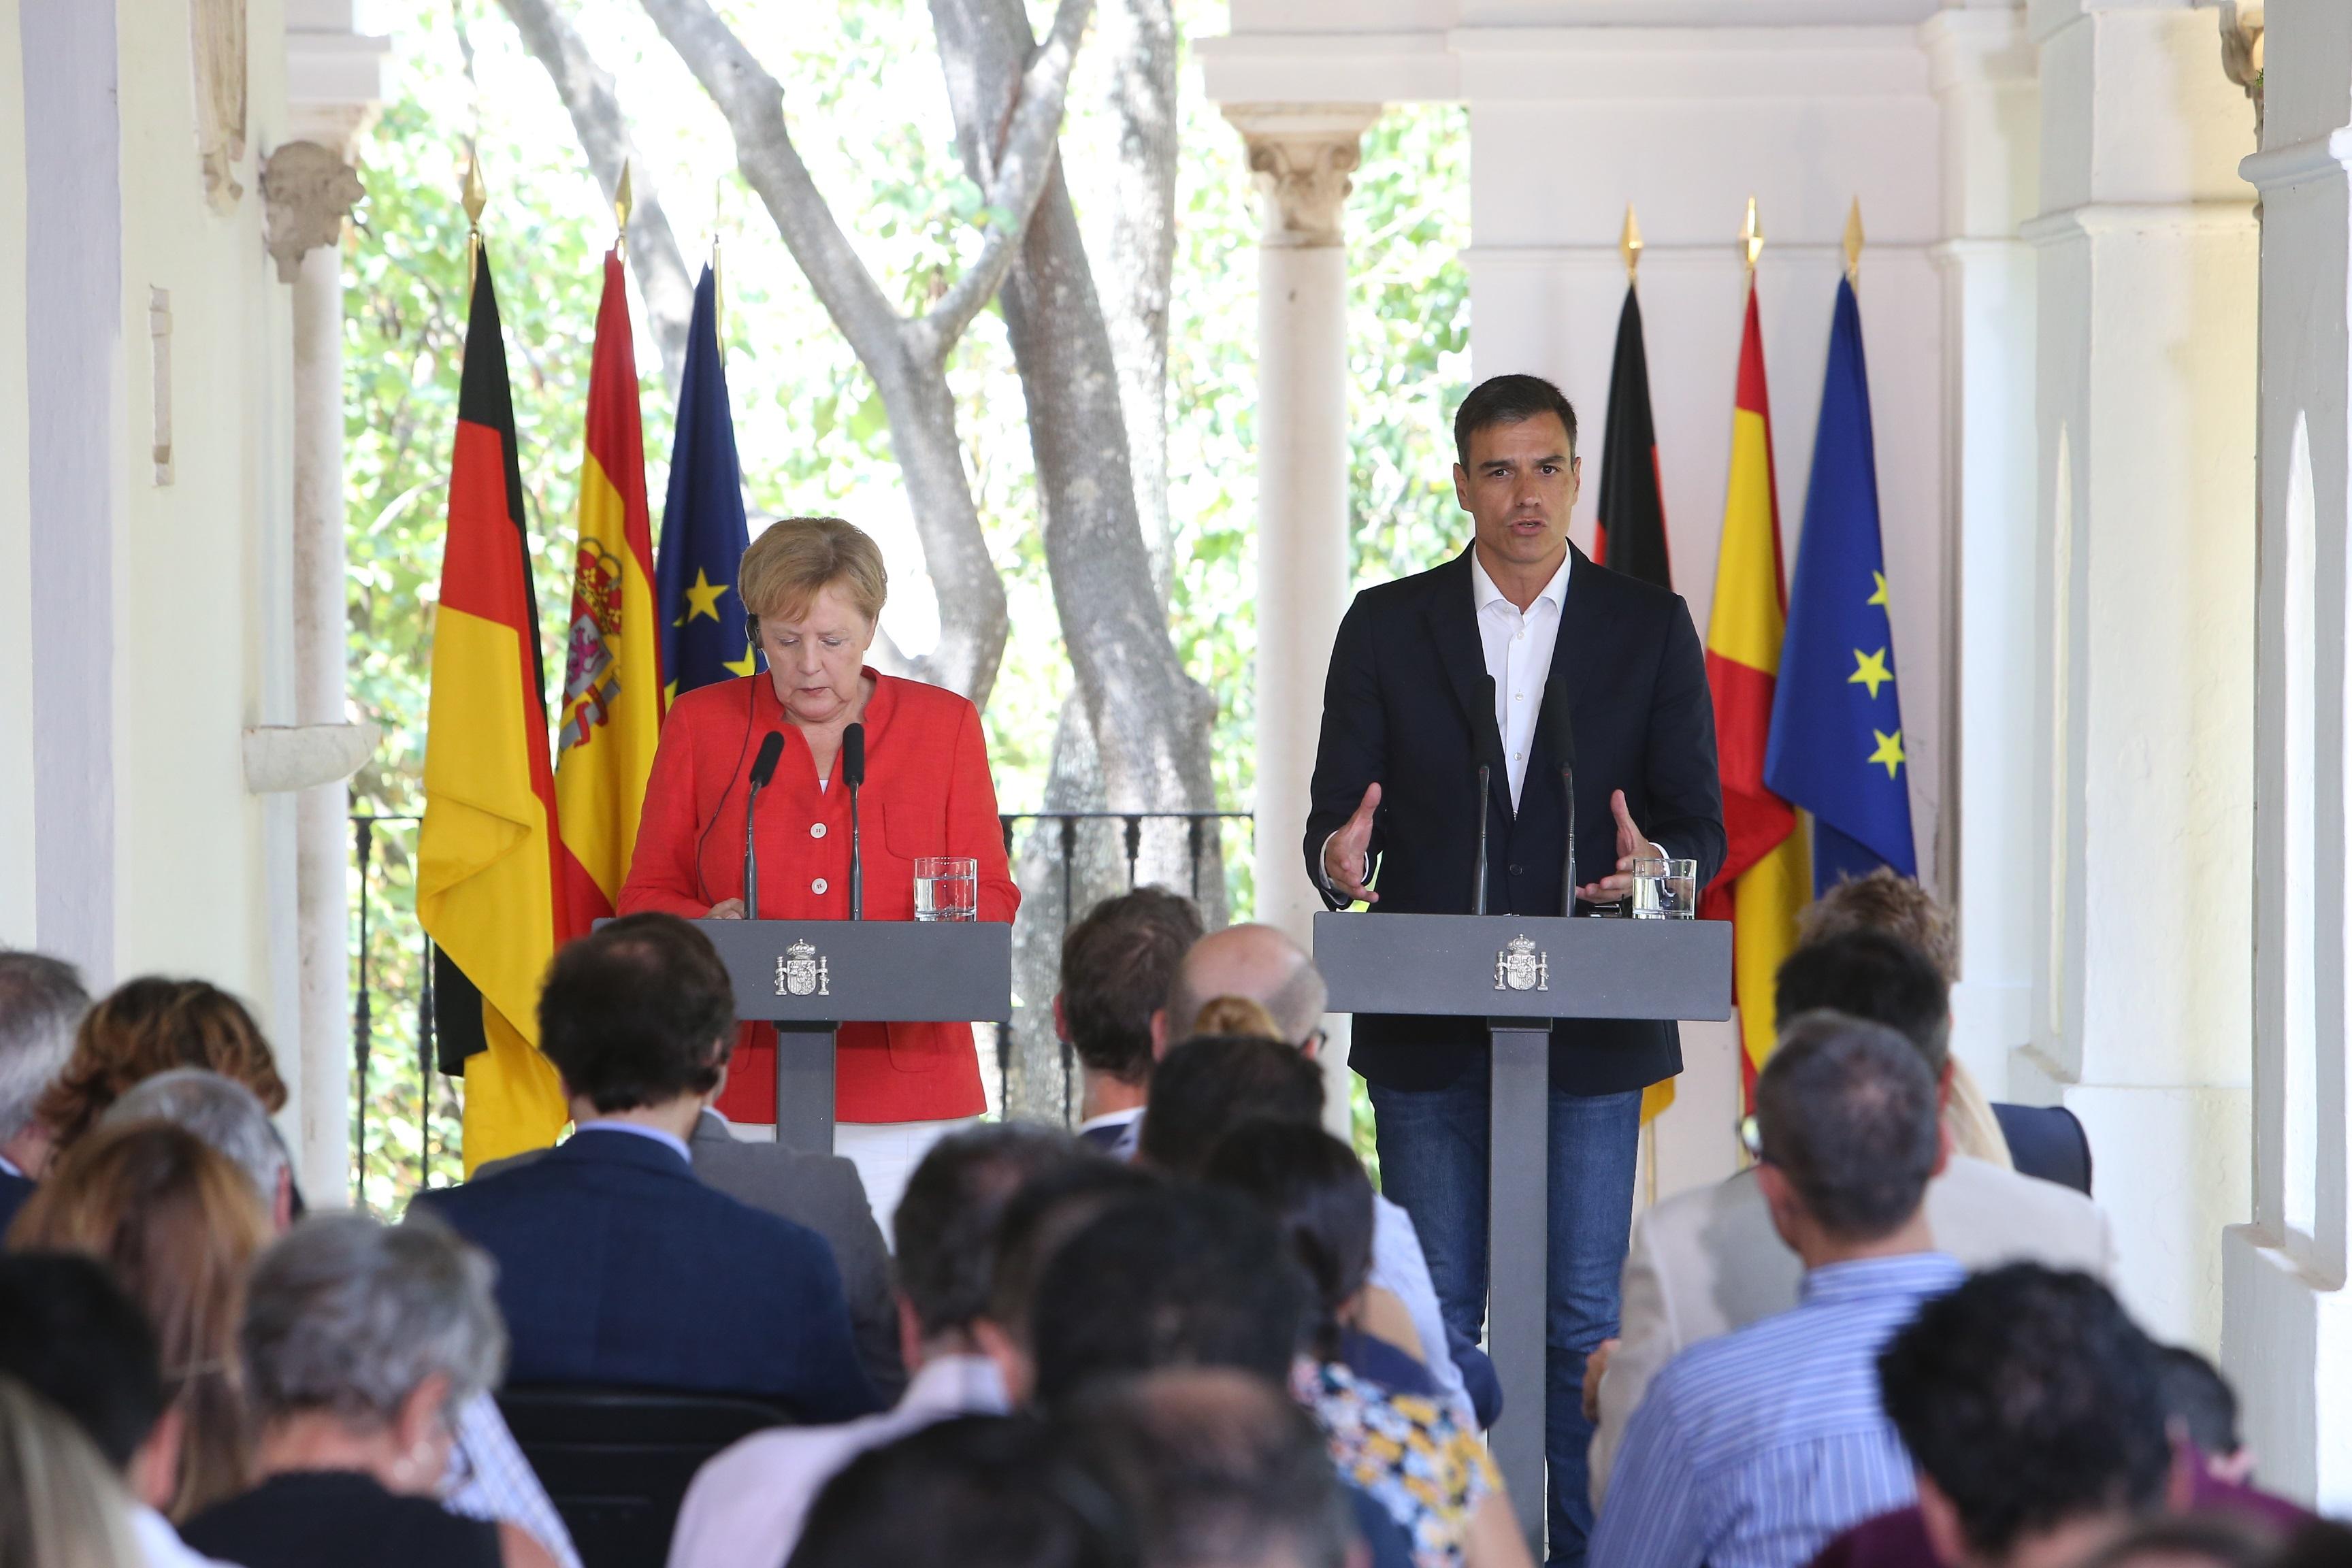 File:Pedro Sánchez y Angela Merkel 07.jpg - Wikimedia Commons